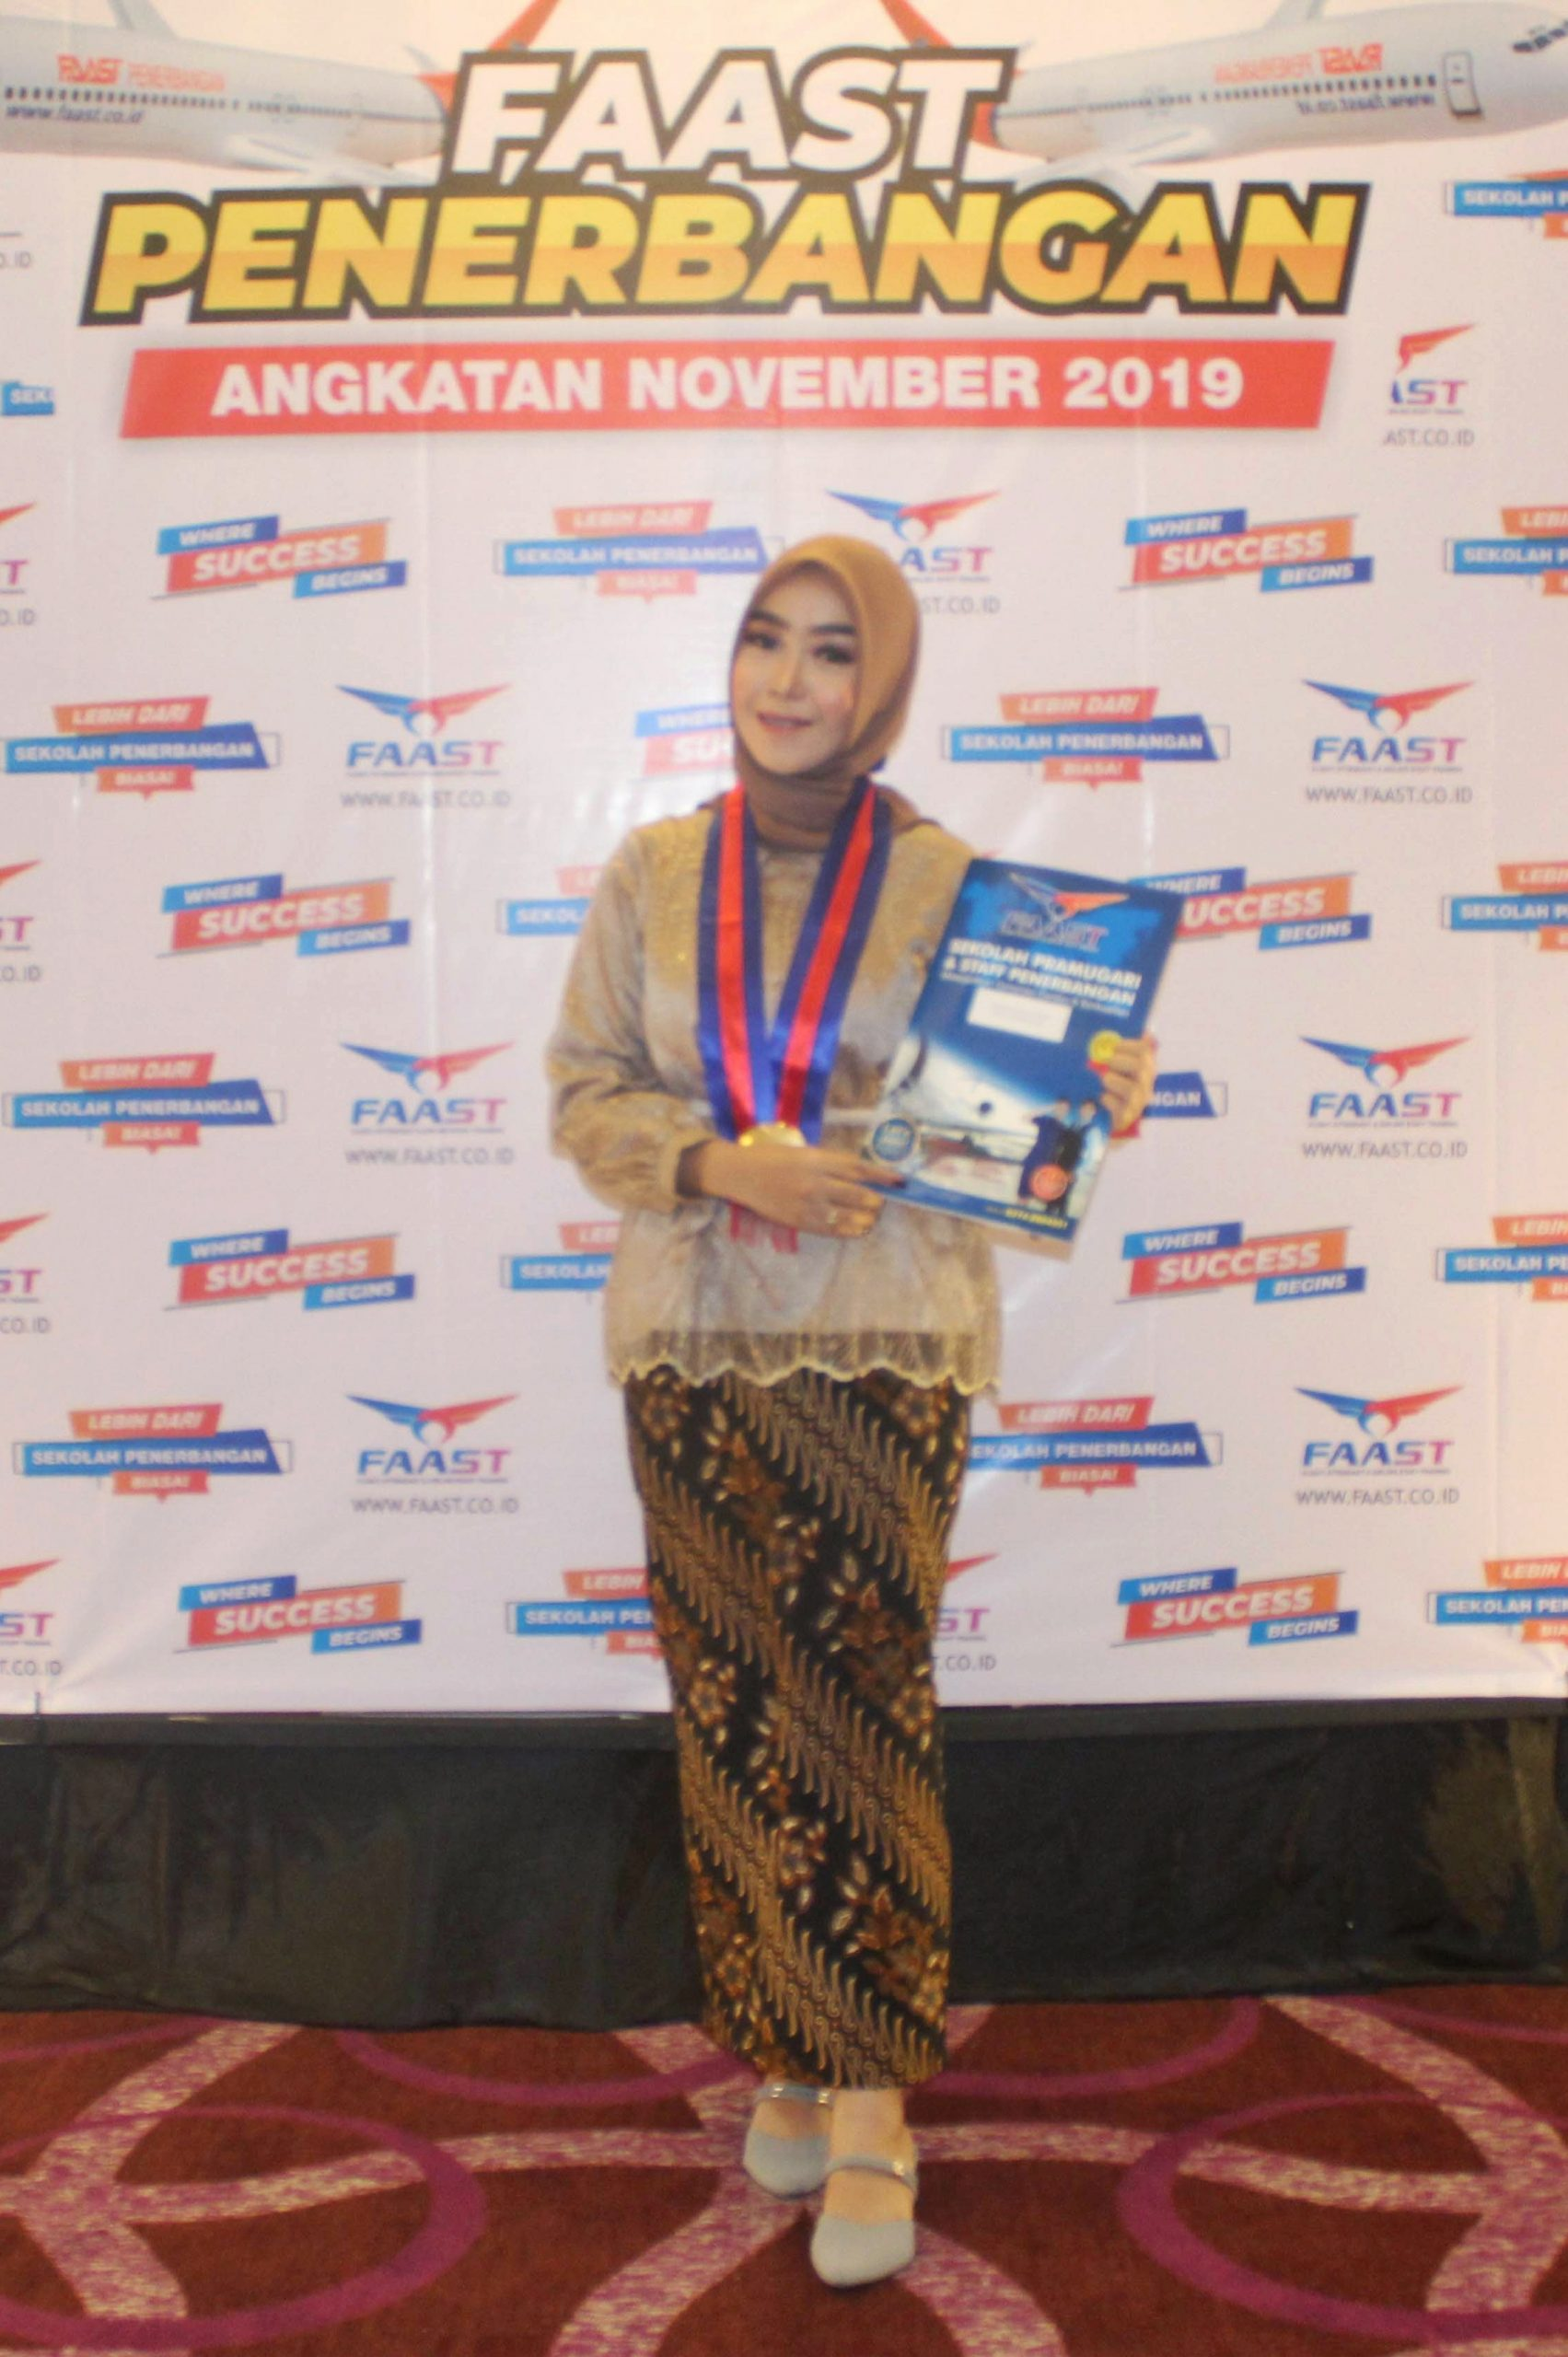 Karir Siswa FAAST Penerbangan Megawati